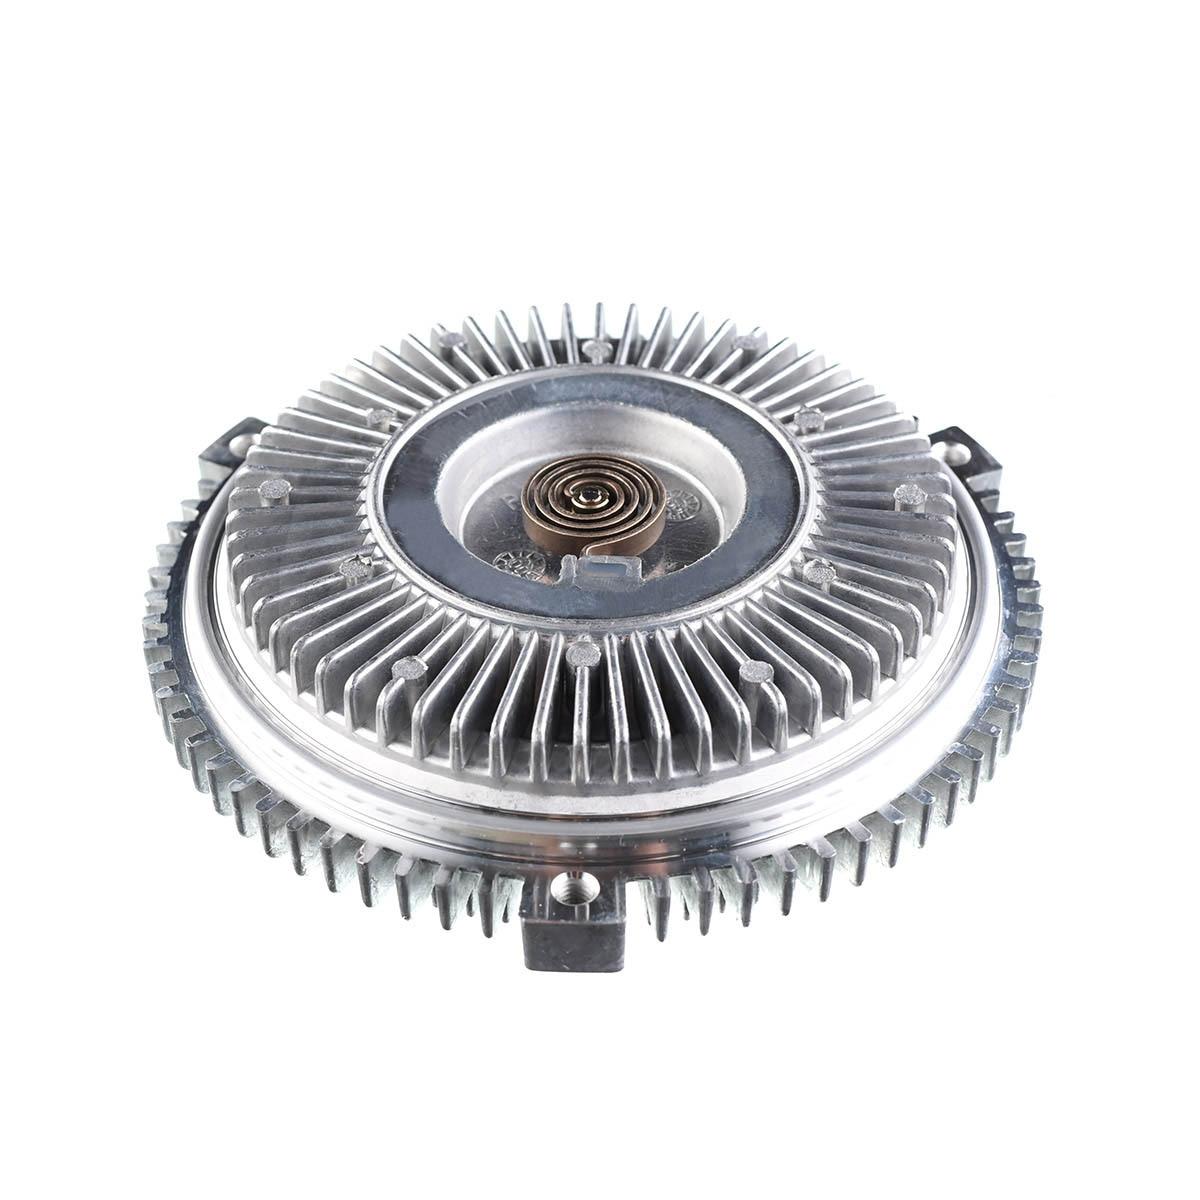 engine cooling fan clutch for bmw e31 e32 e34 e38 e39 530i 540i 740i 750il 840ci 11527502804 11521723829 11521745134 in fans kits from automobiles  [ 1200 x 1200 Pixel ]